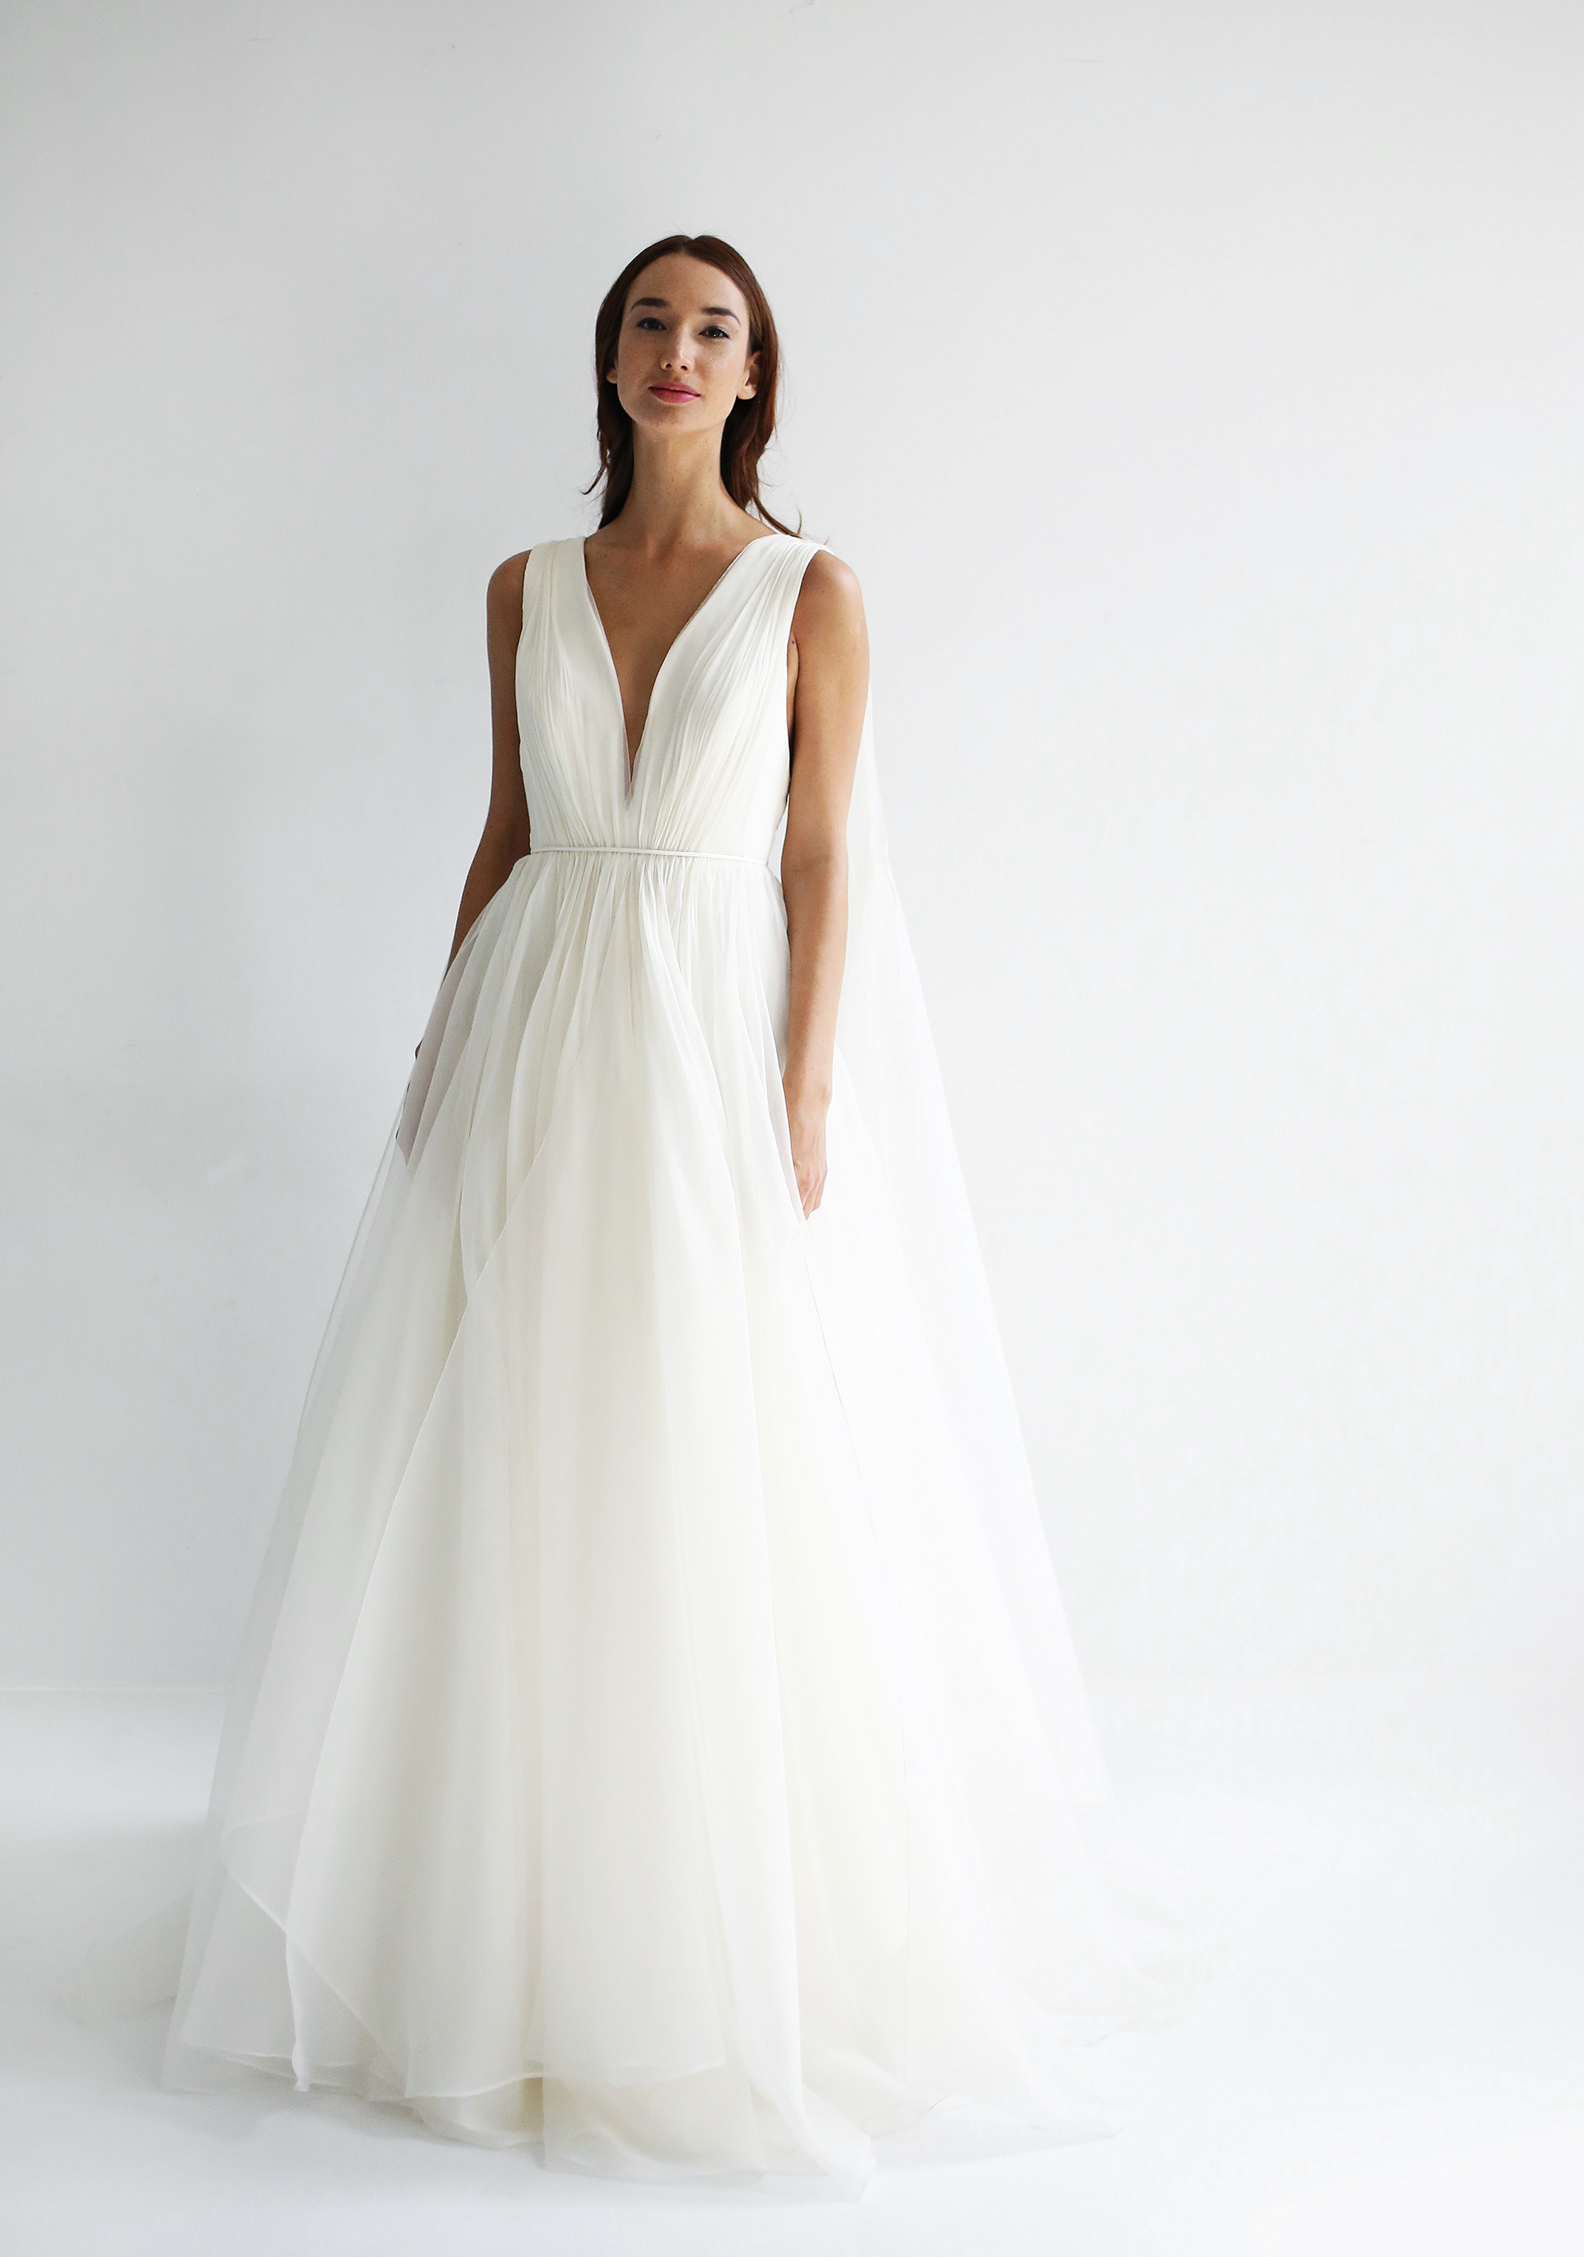 leanne marshall wedding dress spring 2019 sleeveless a-line deep v tulle